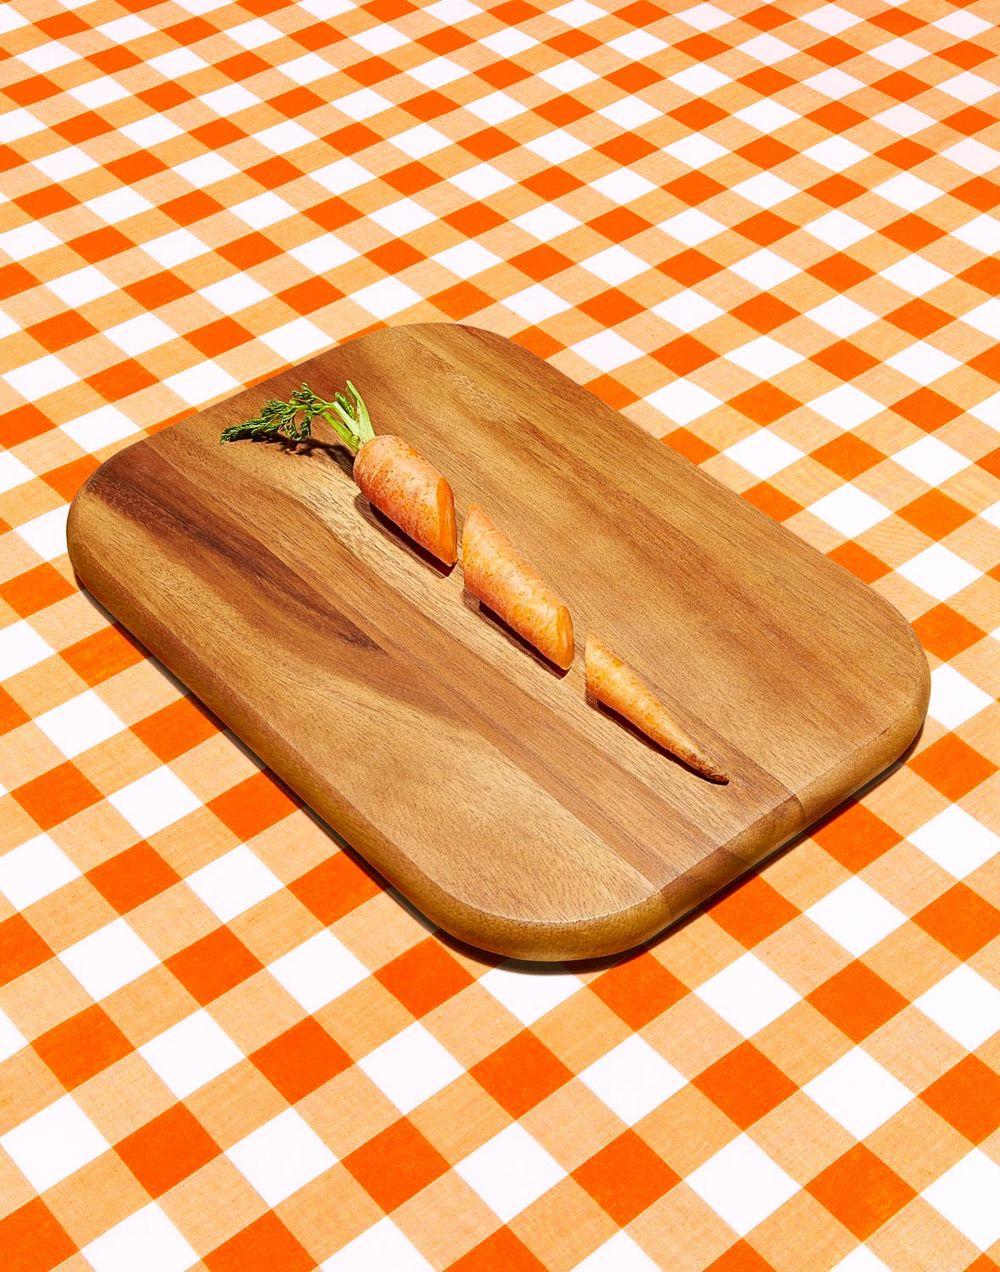 Chopped-Carrot.jpg